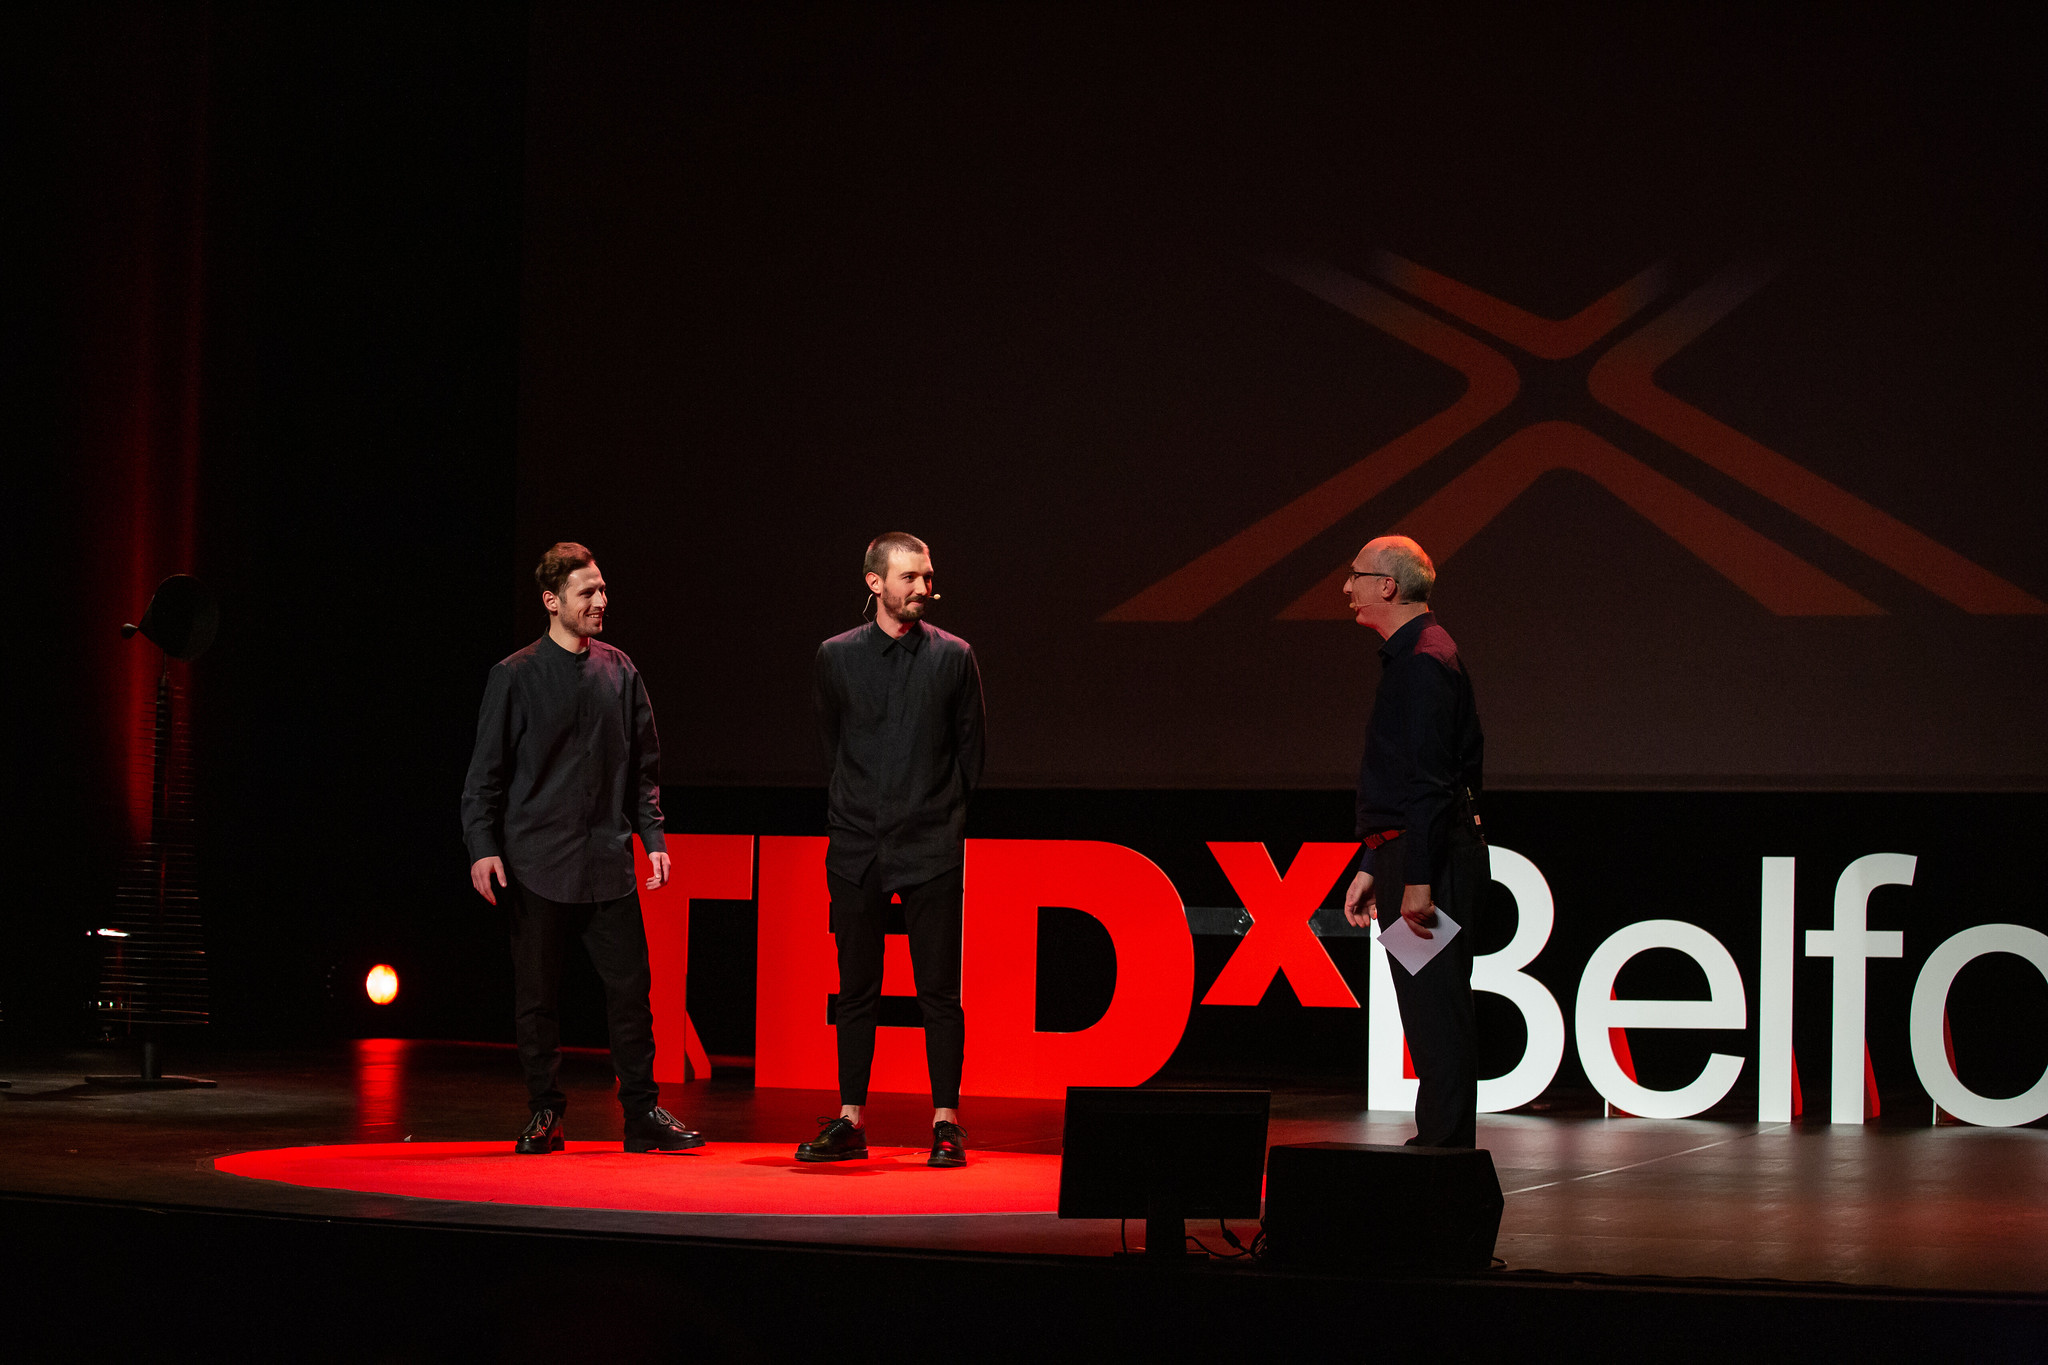 Tedx-belfort-fin-speech-architecture